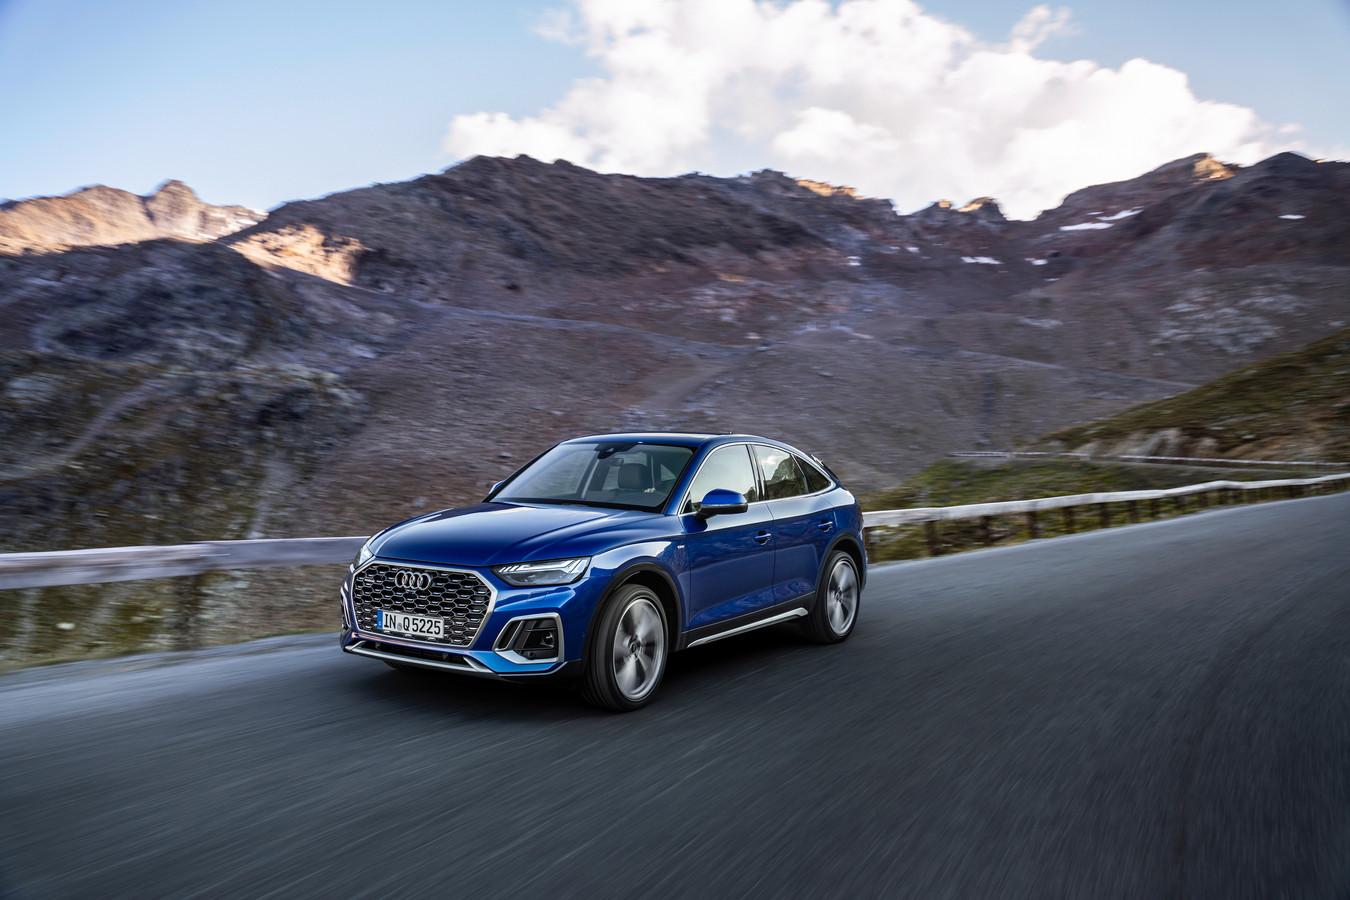 De nieuwe Audi Q5 Sportback